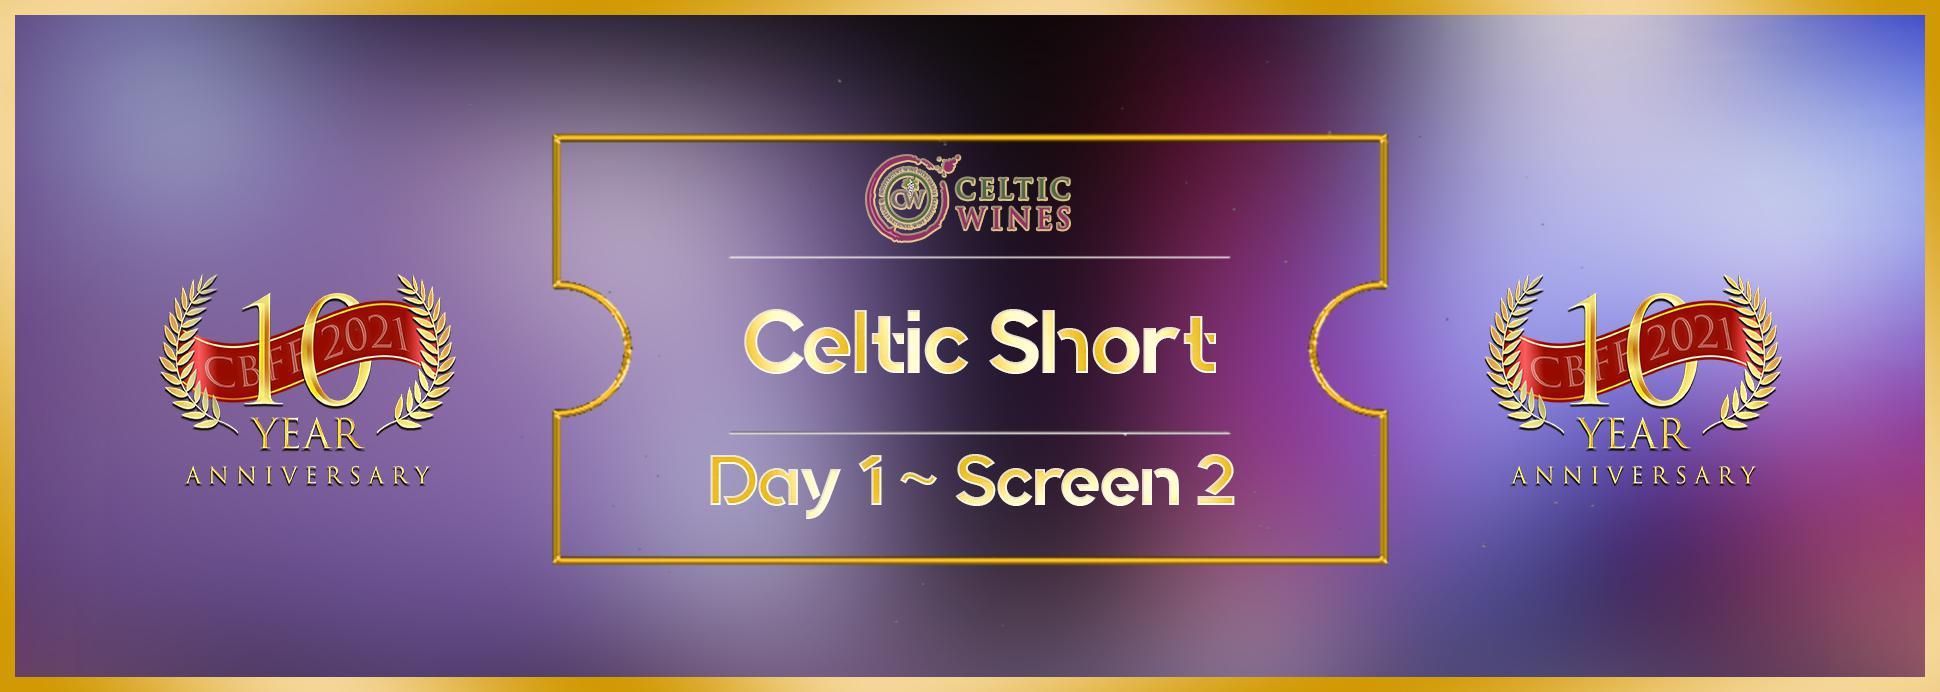 Day 1, Screen 2: Celtic Short